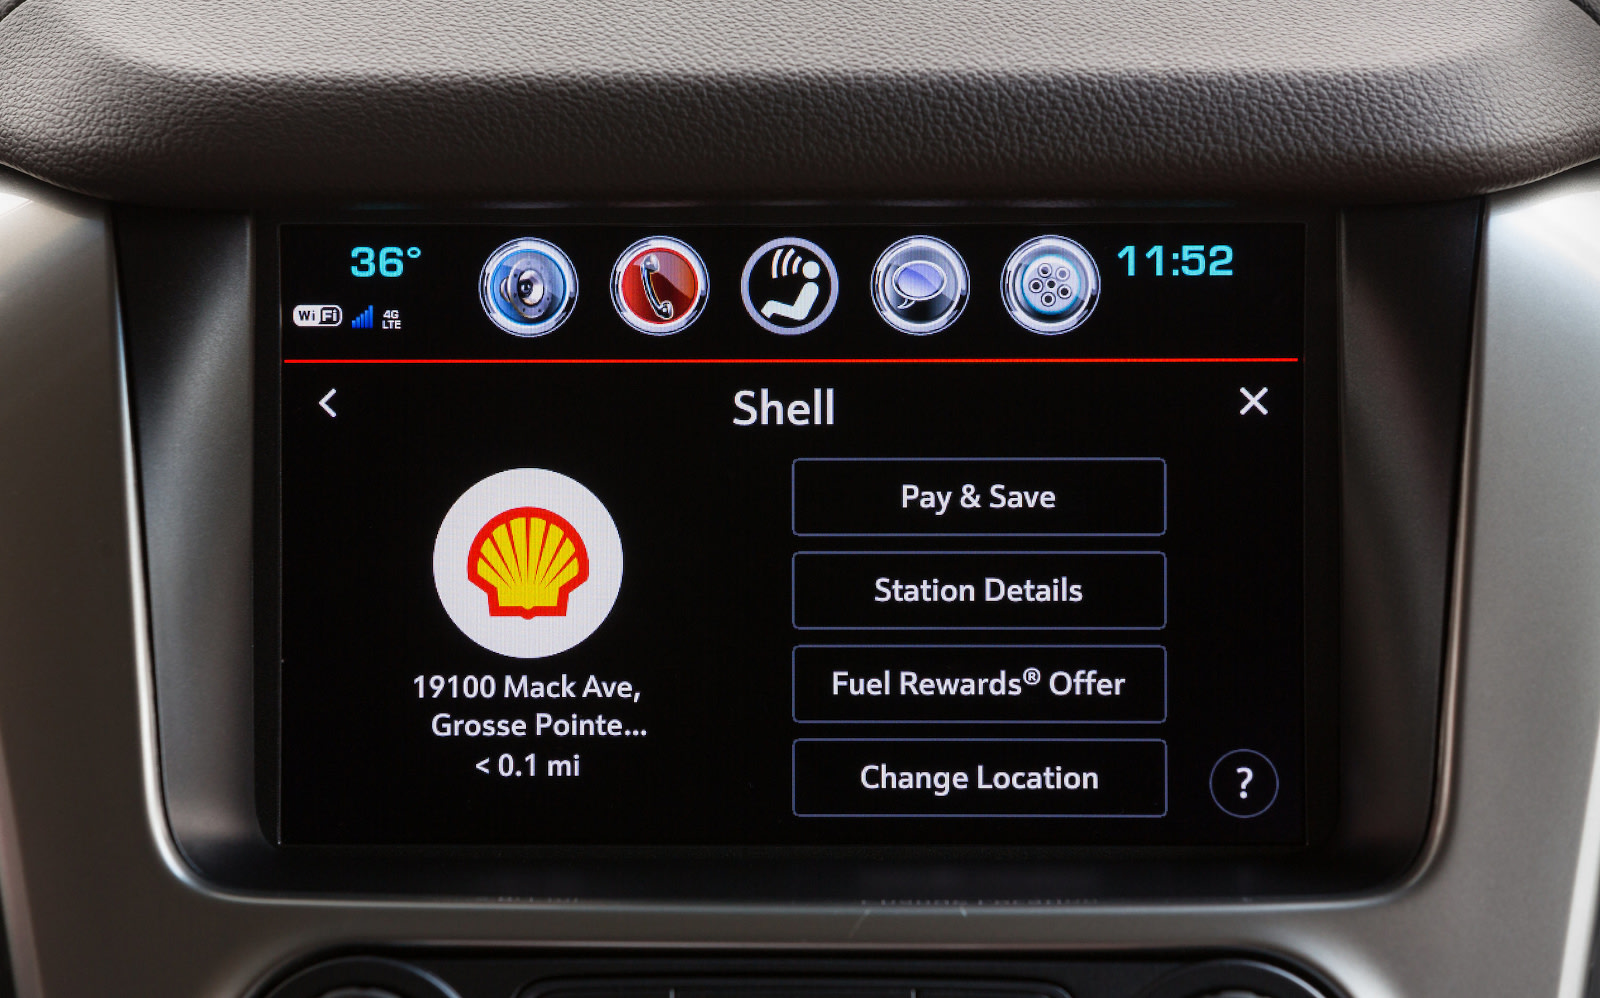 chevyshell - Uber Fuel Rewards Card Activation